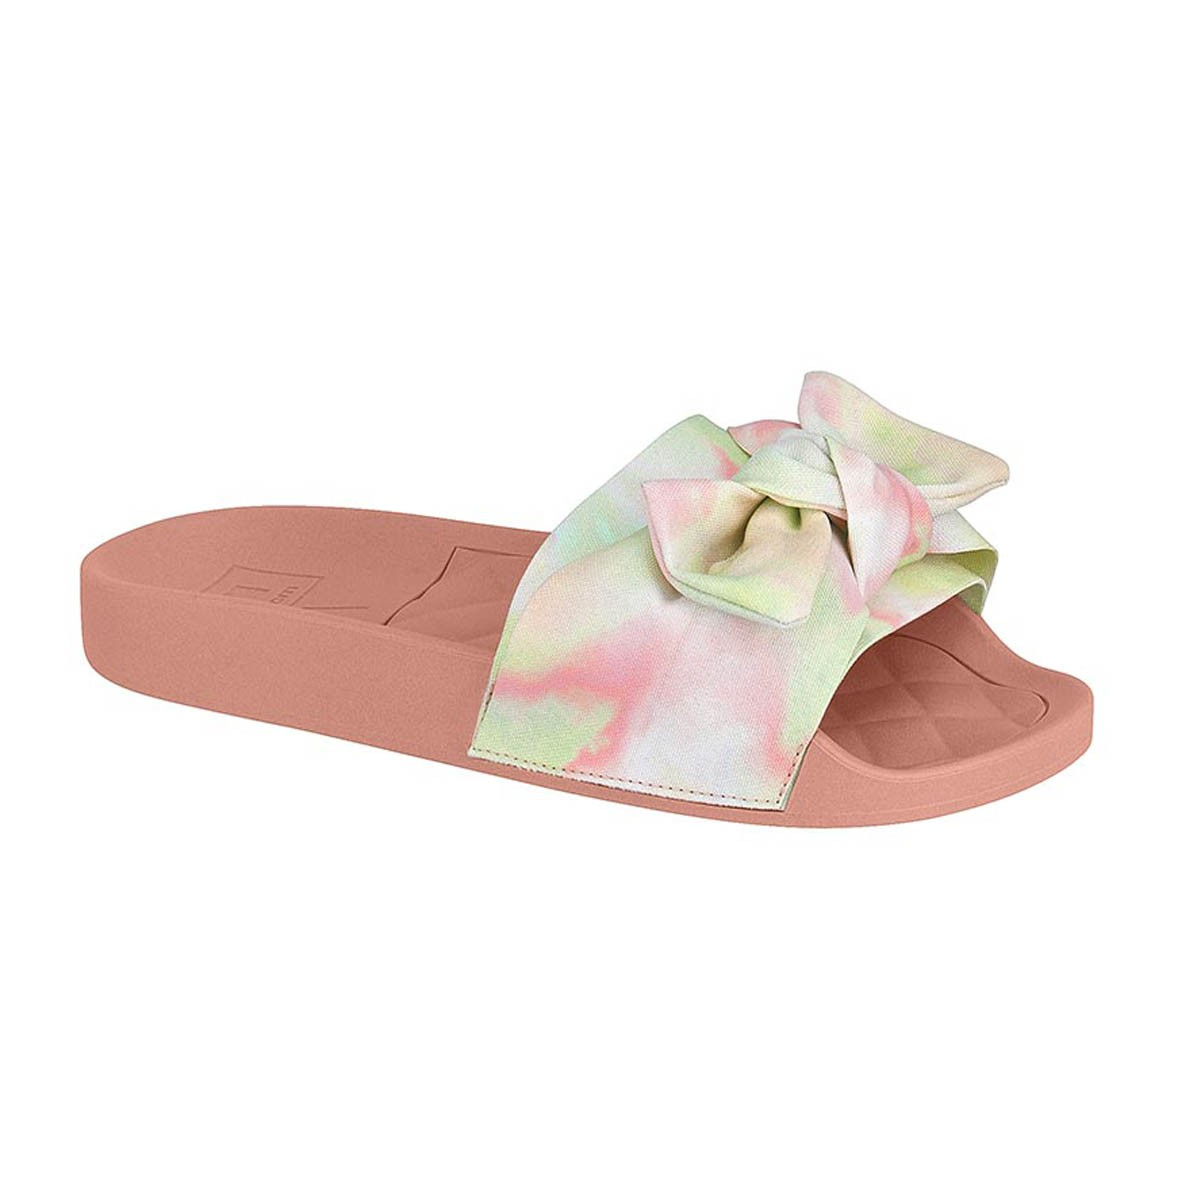 Chinelo Slide Tie Dye Moleca feminino 5414.104